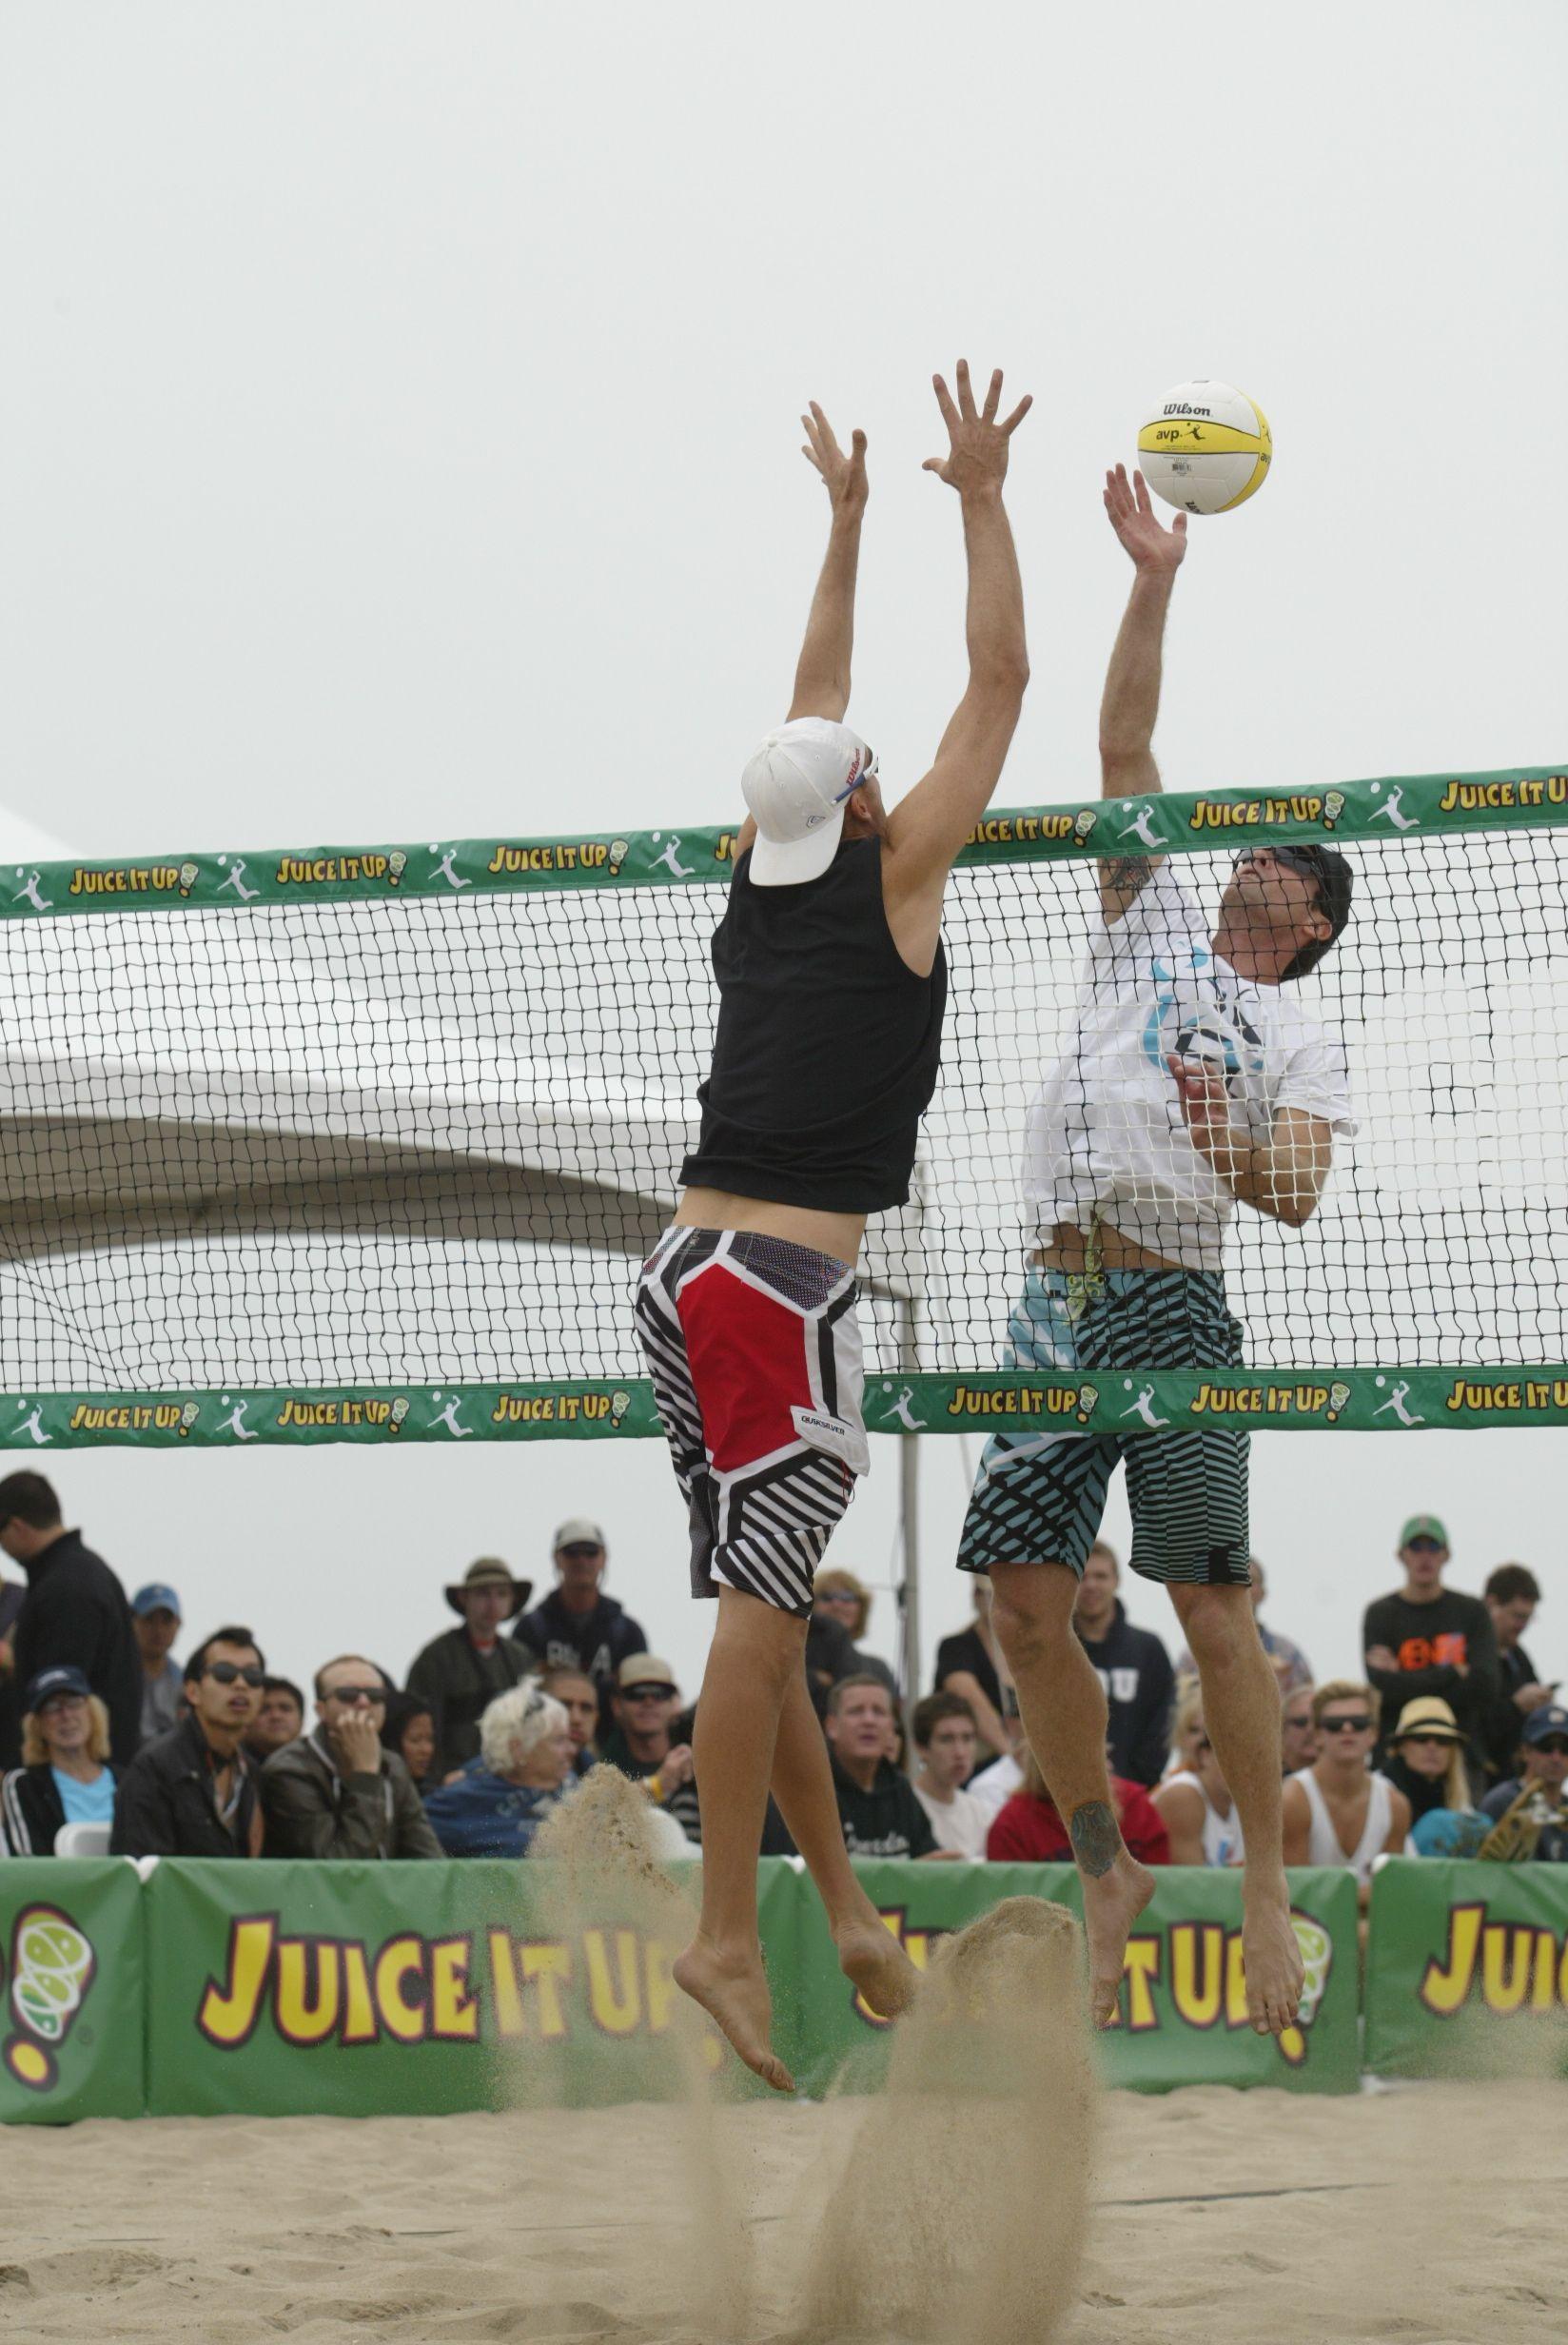 Avp Beach Volleyball Juiceitup Avp Volleyball Summer Beach Beach Volleyball Volleyball Pictures Volleyball